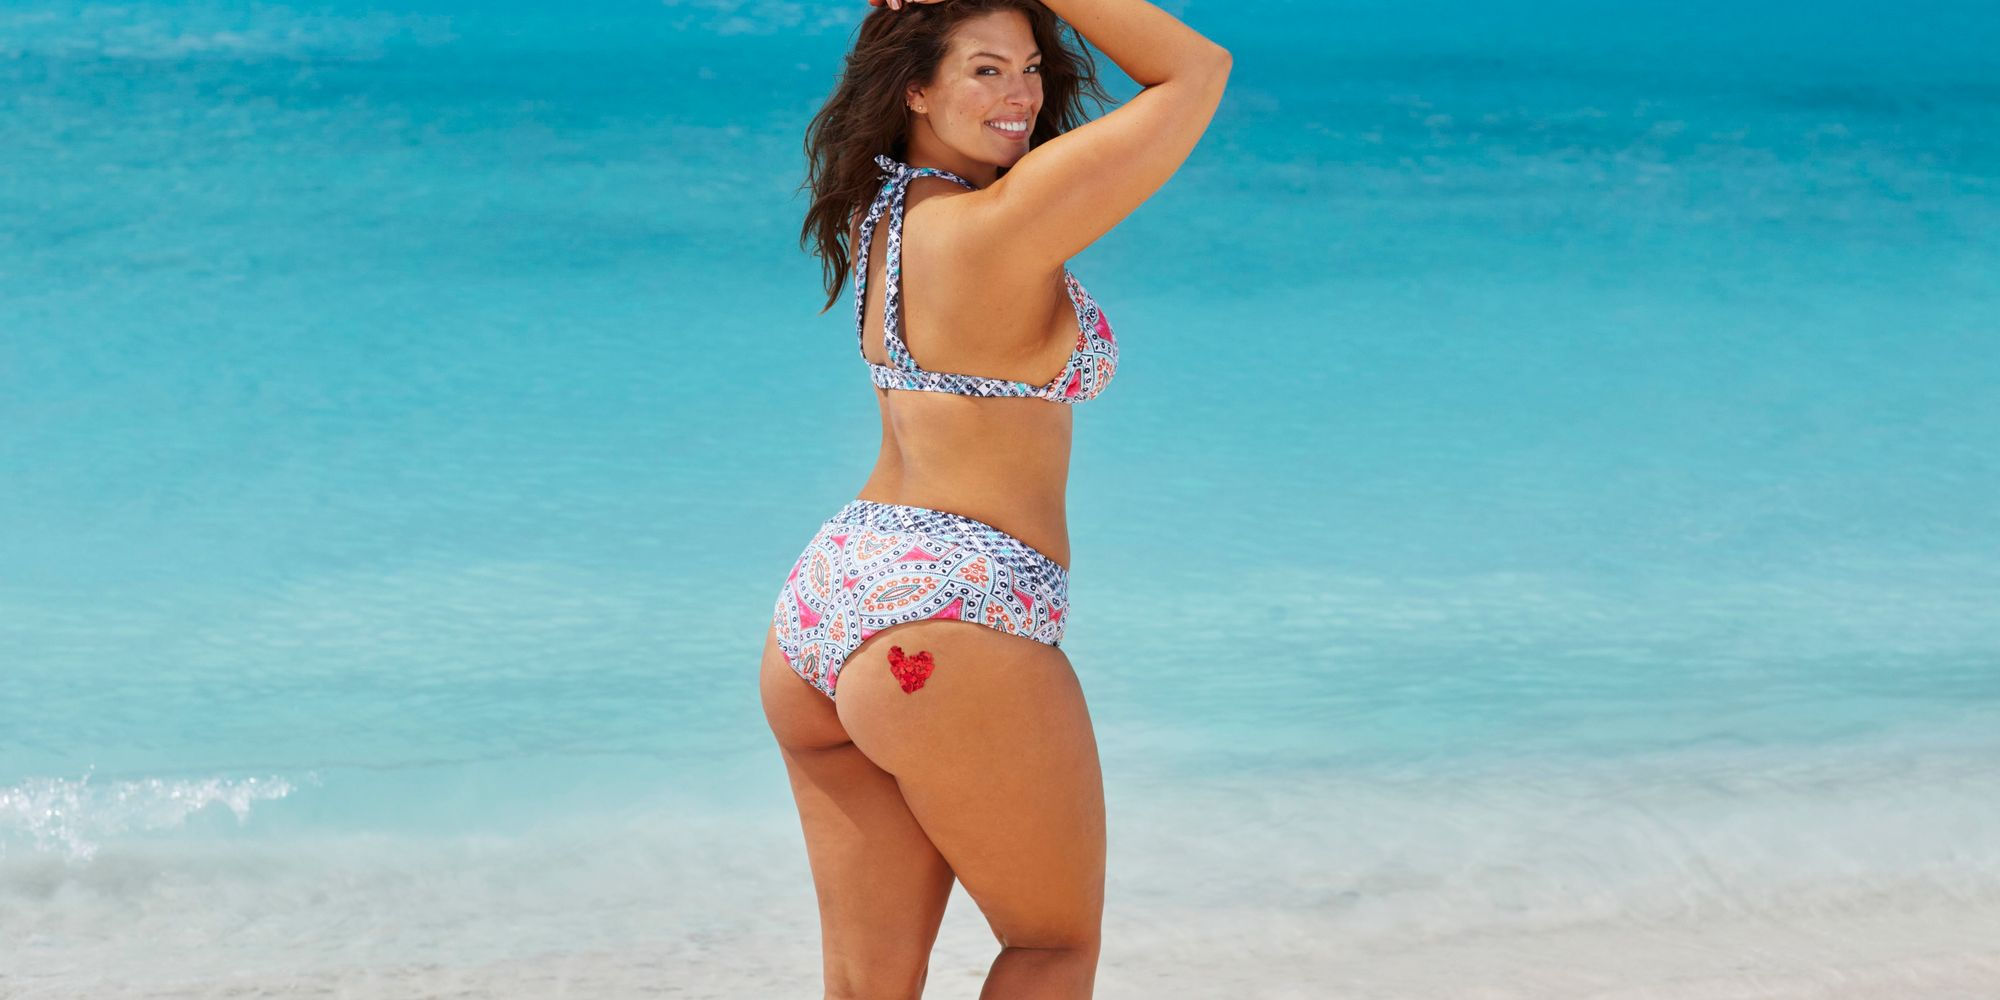 hendersons bikini florence